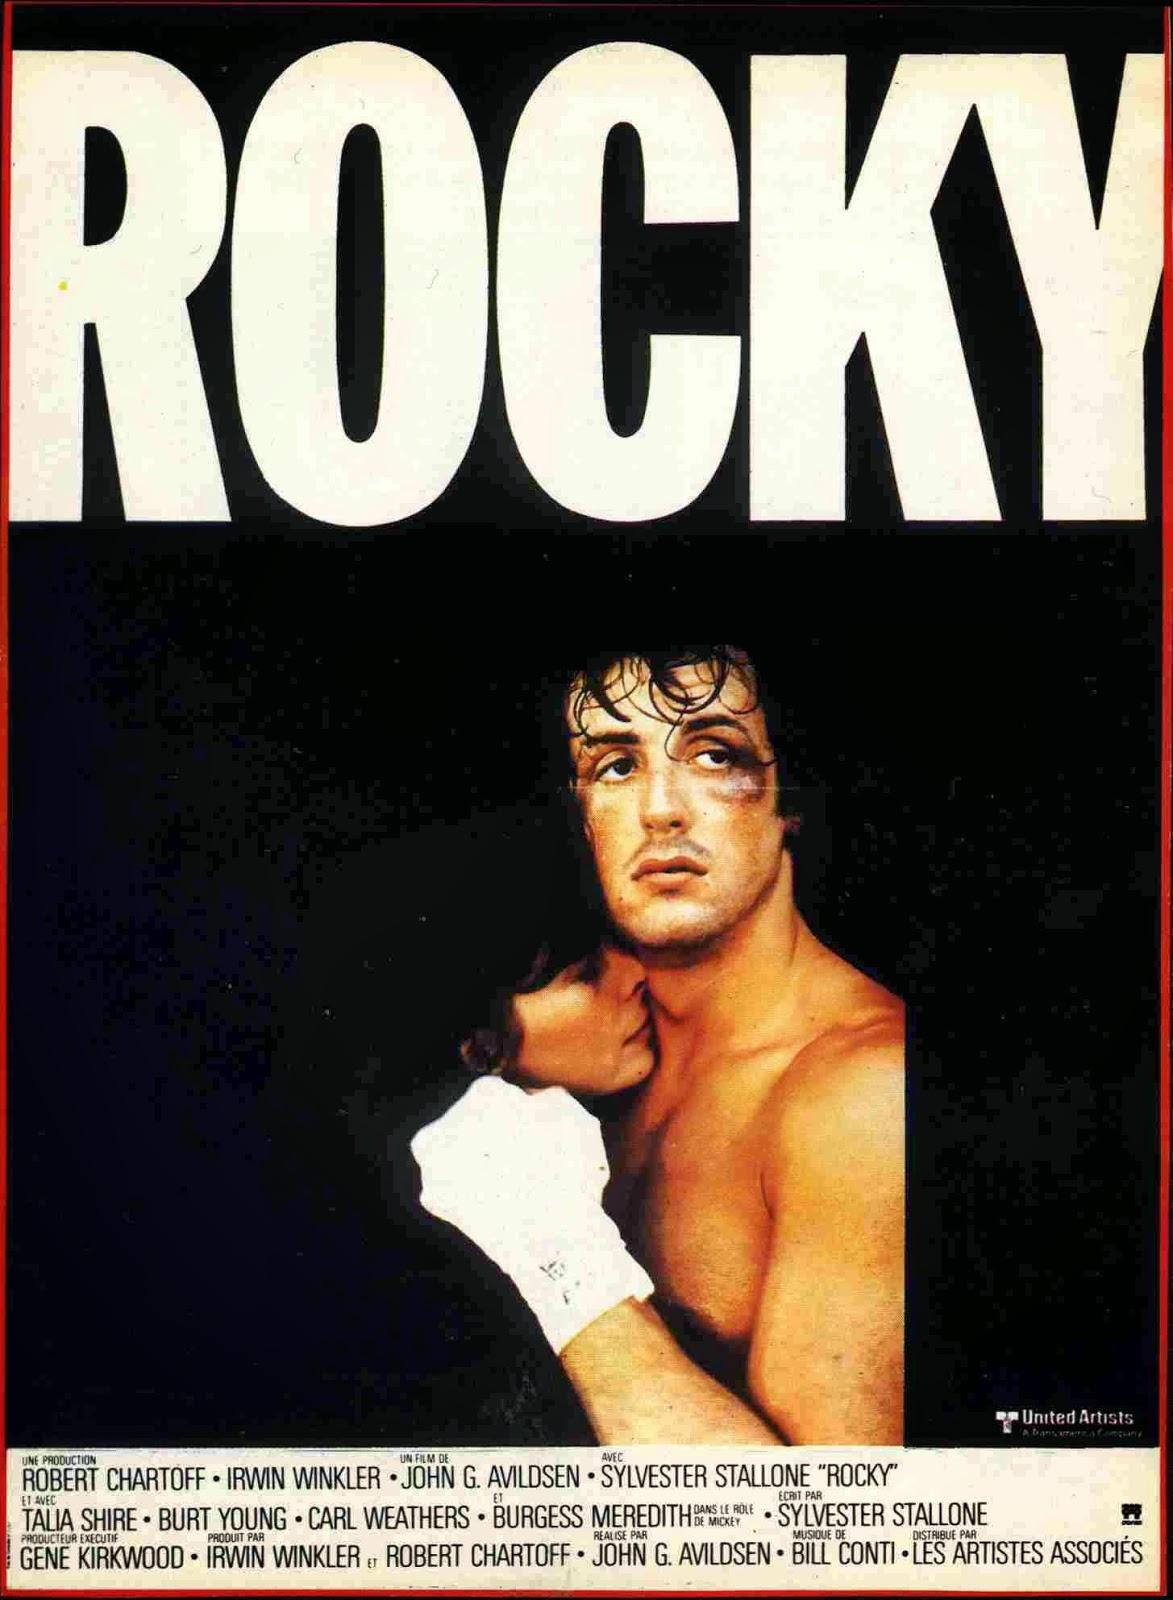 Happyotter: ROCKY (1976)